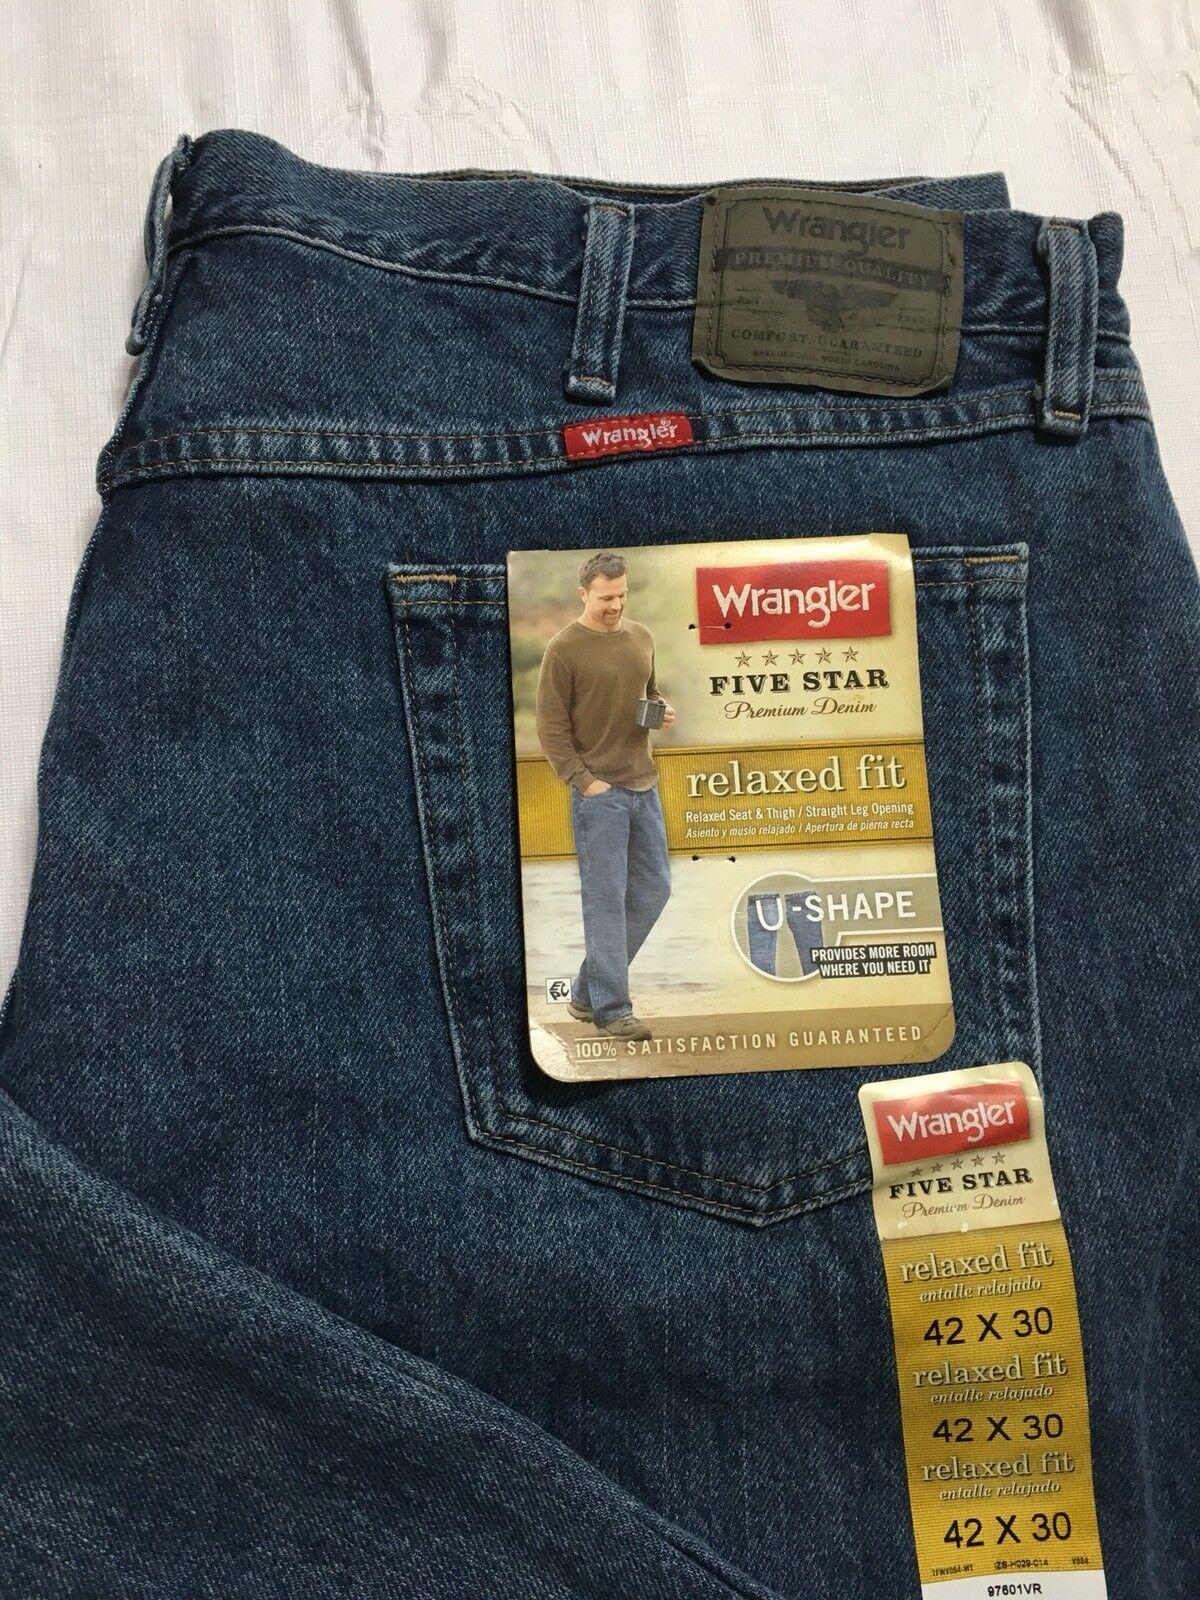 Wrangler Five Star Jeans Men's 42x30  Relaxed Fit Straight Leg bluee Denim NWT